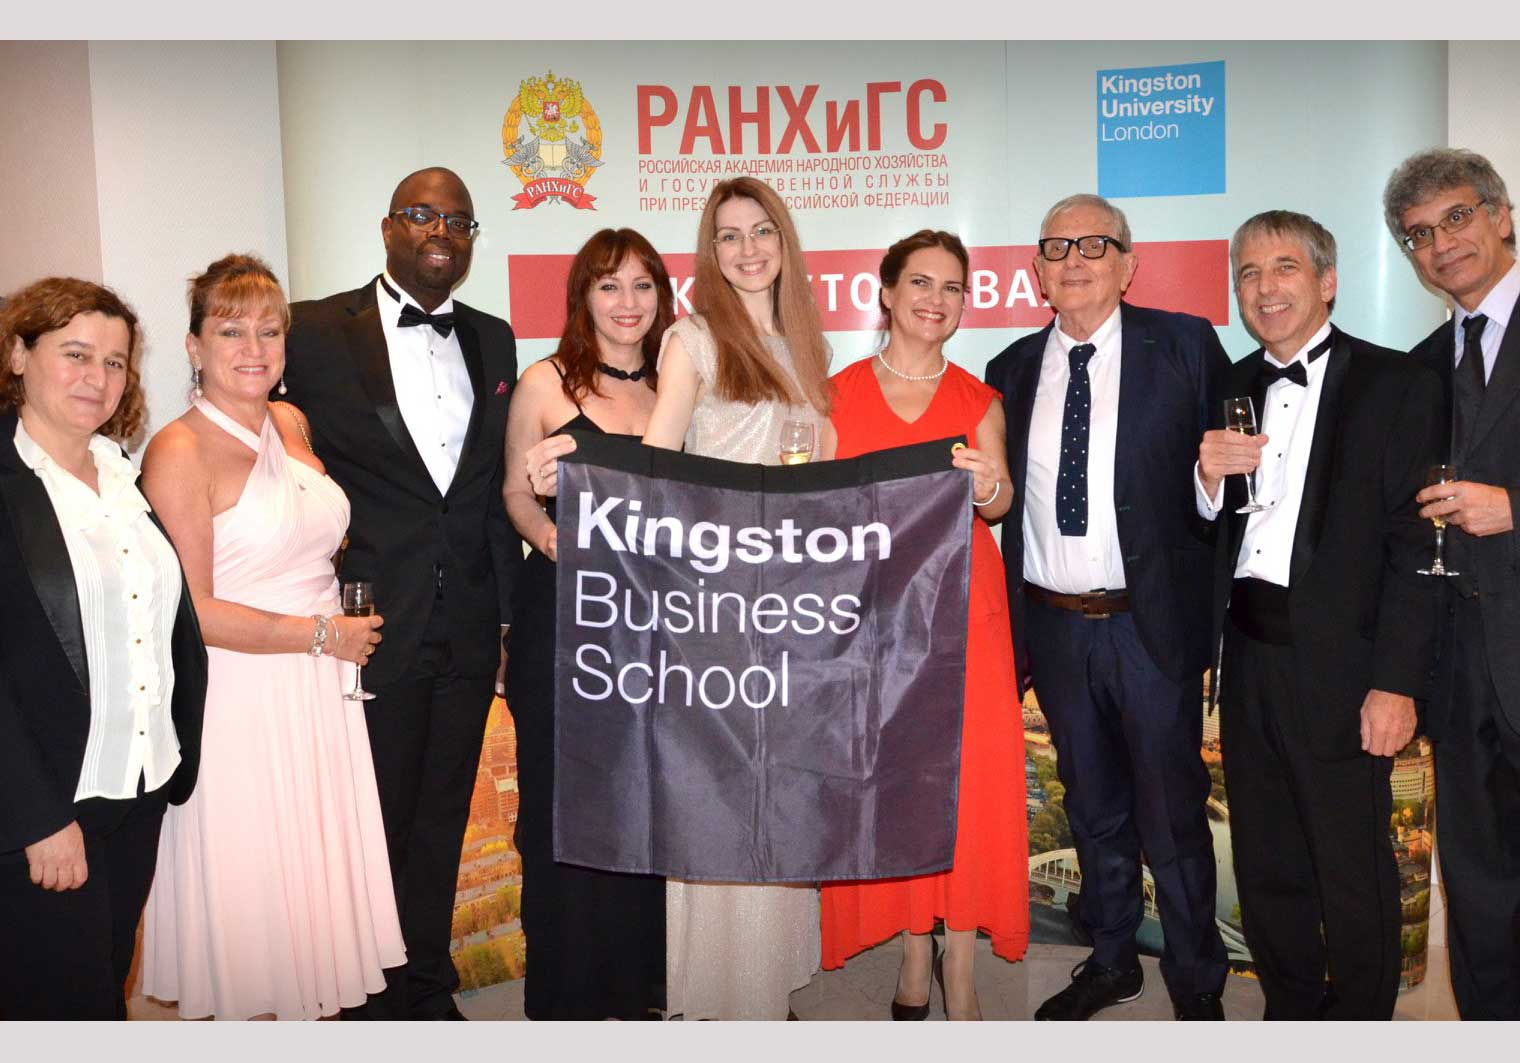 РАНХиГС и Kingston University London – 20 лет вместе